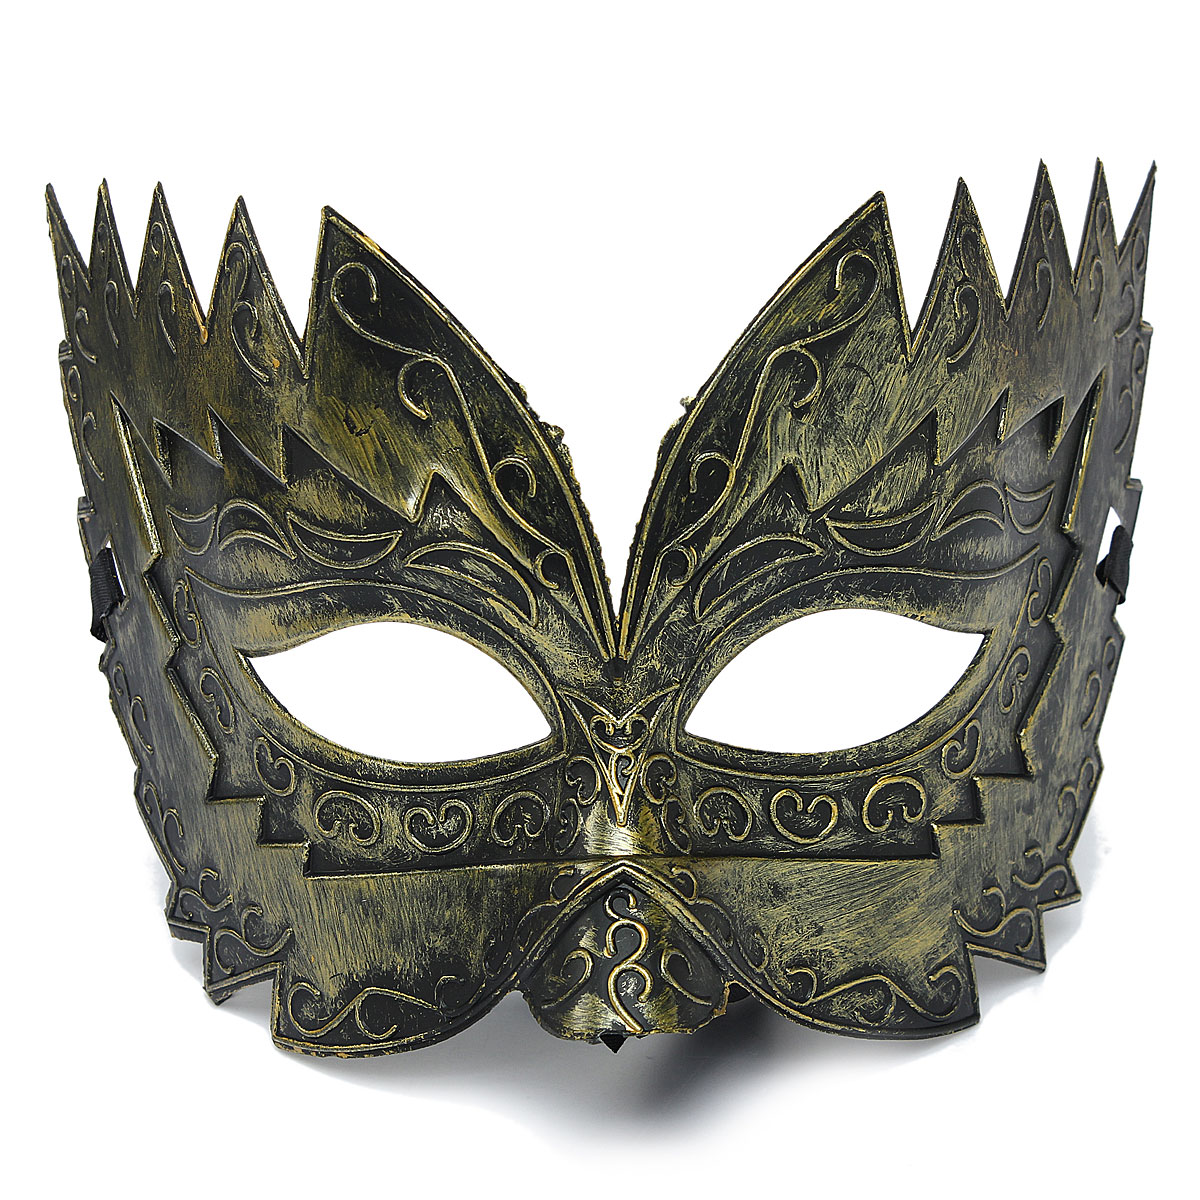 herren maske augenmaske gesichtsmaske f r maskenball r mische party kost m ebay. Black Bedroom Furniture Sets. Home Design Ideas